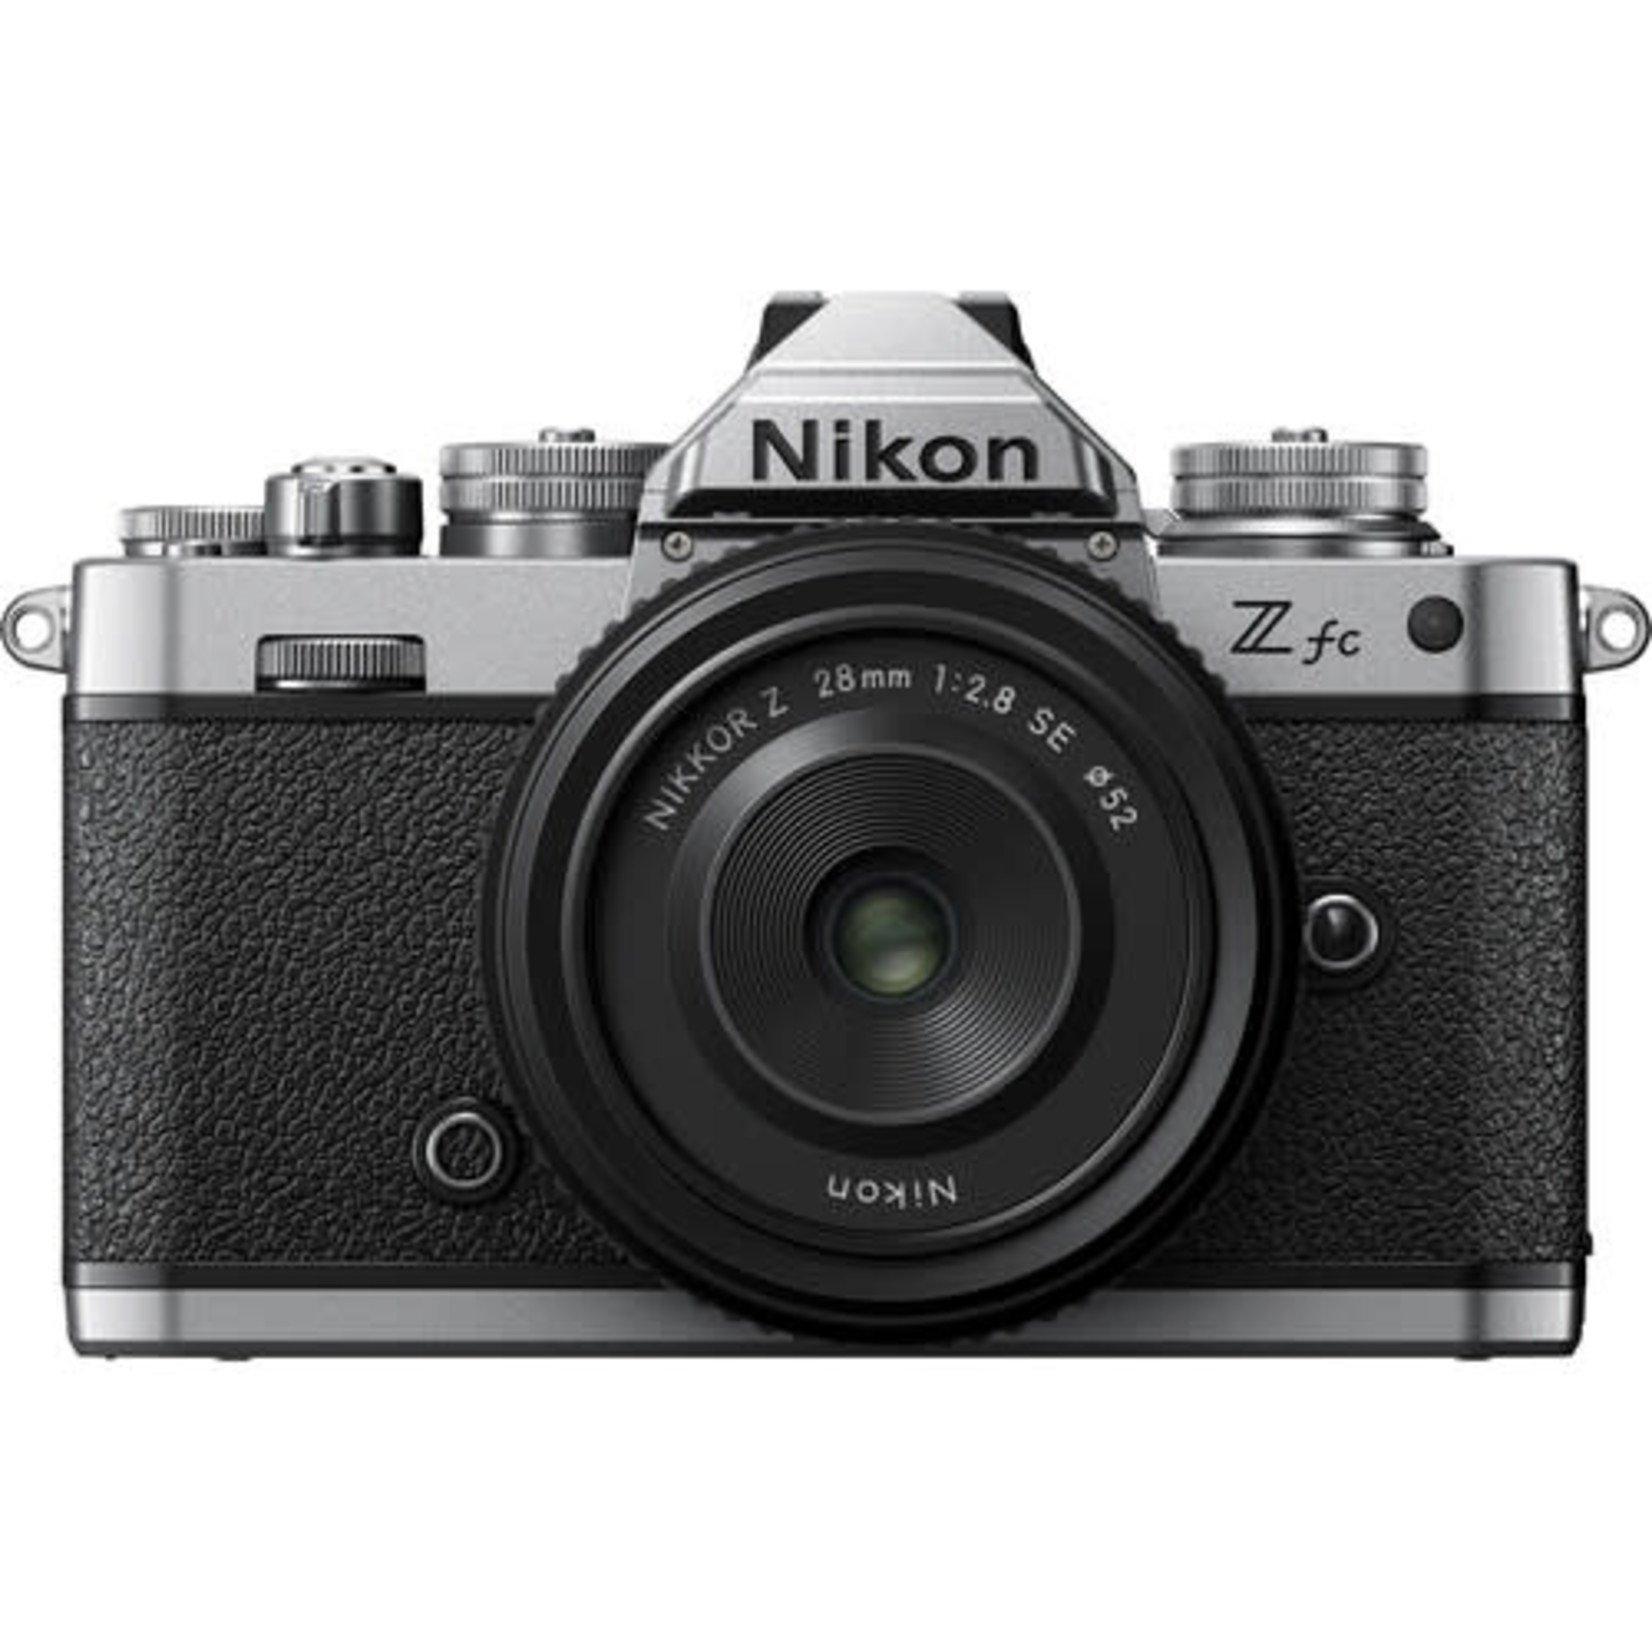 Nikon Nikon Z fc Mirrorless Digital Camera with 28mm Lens